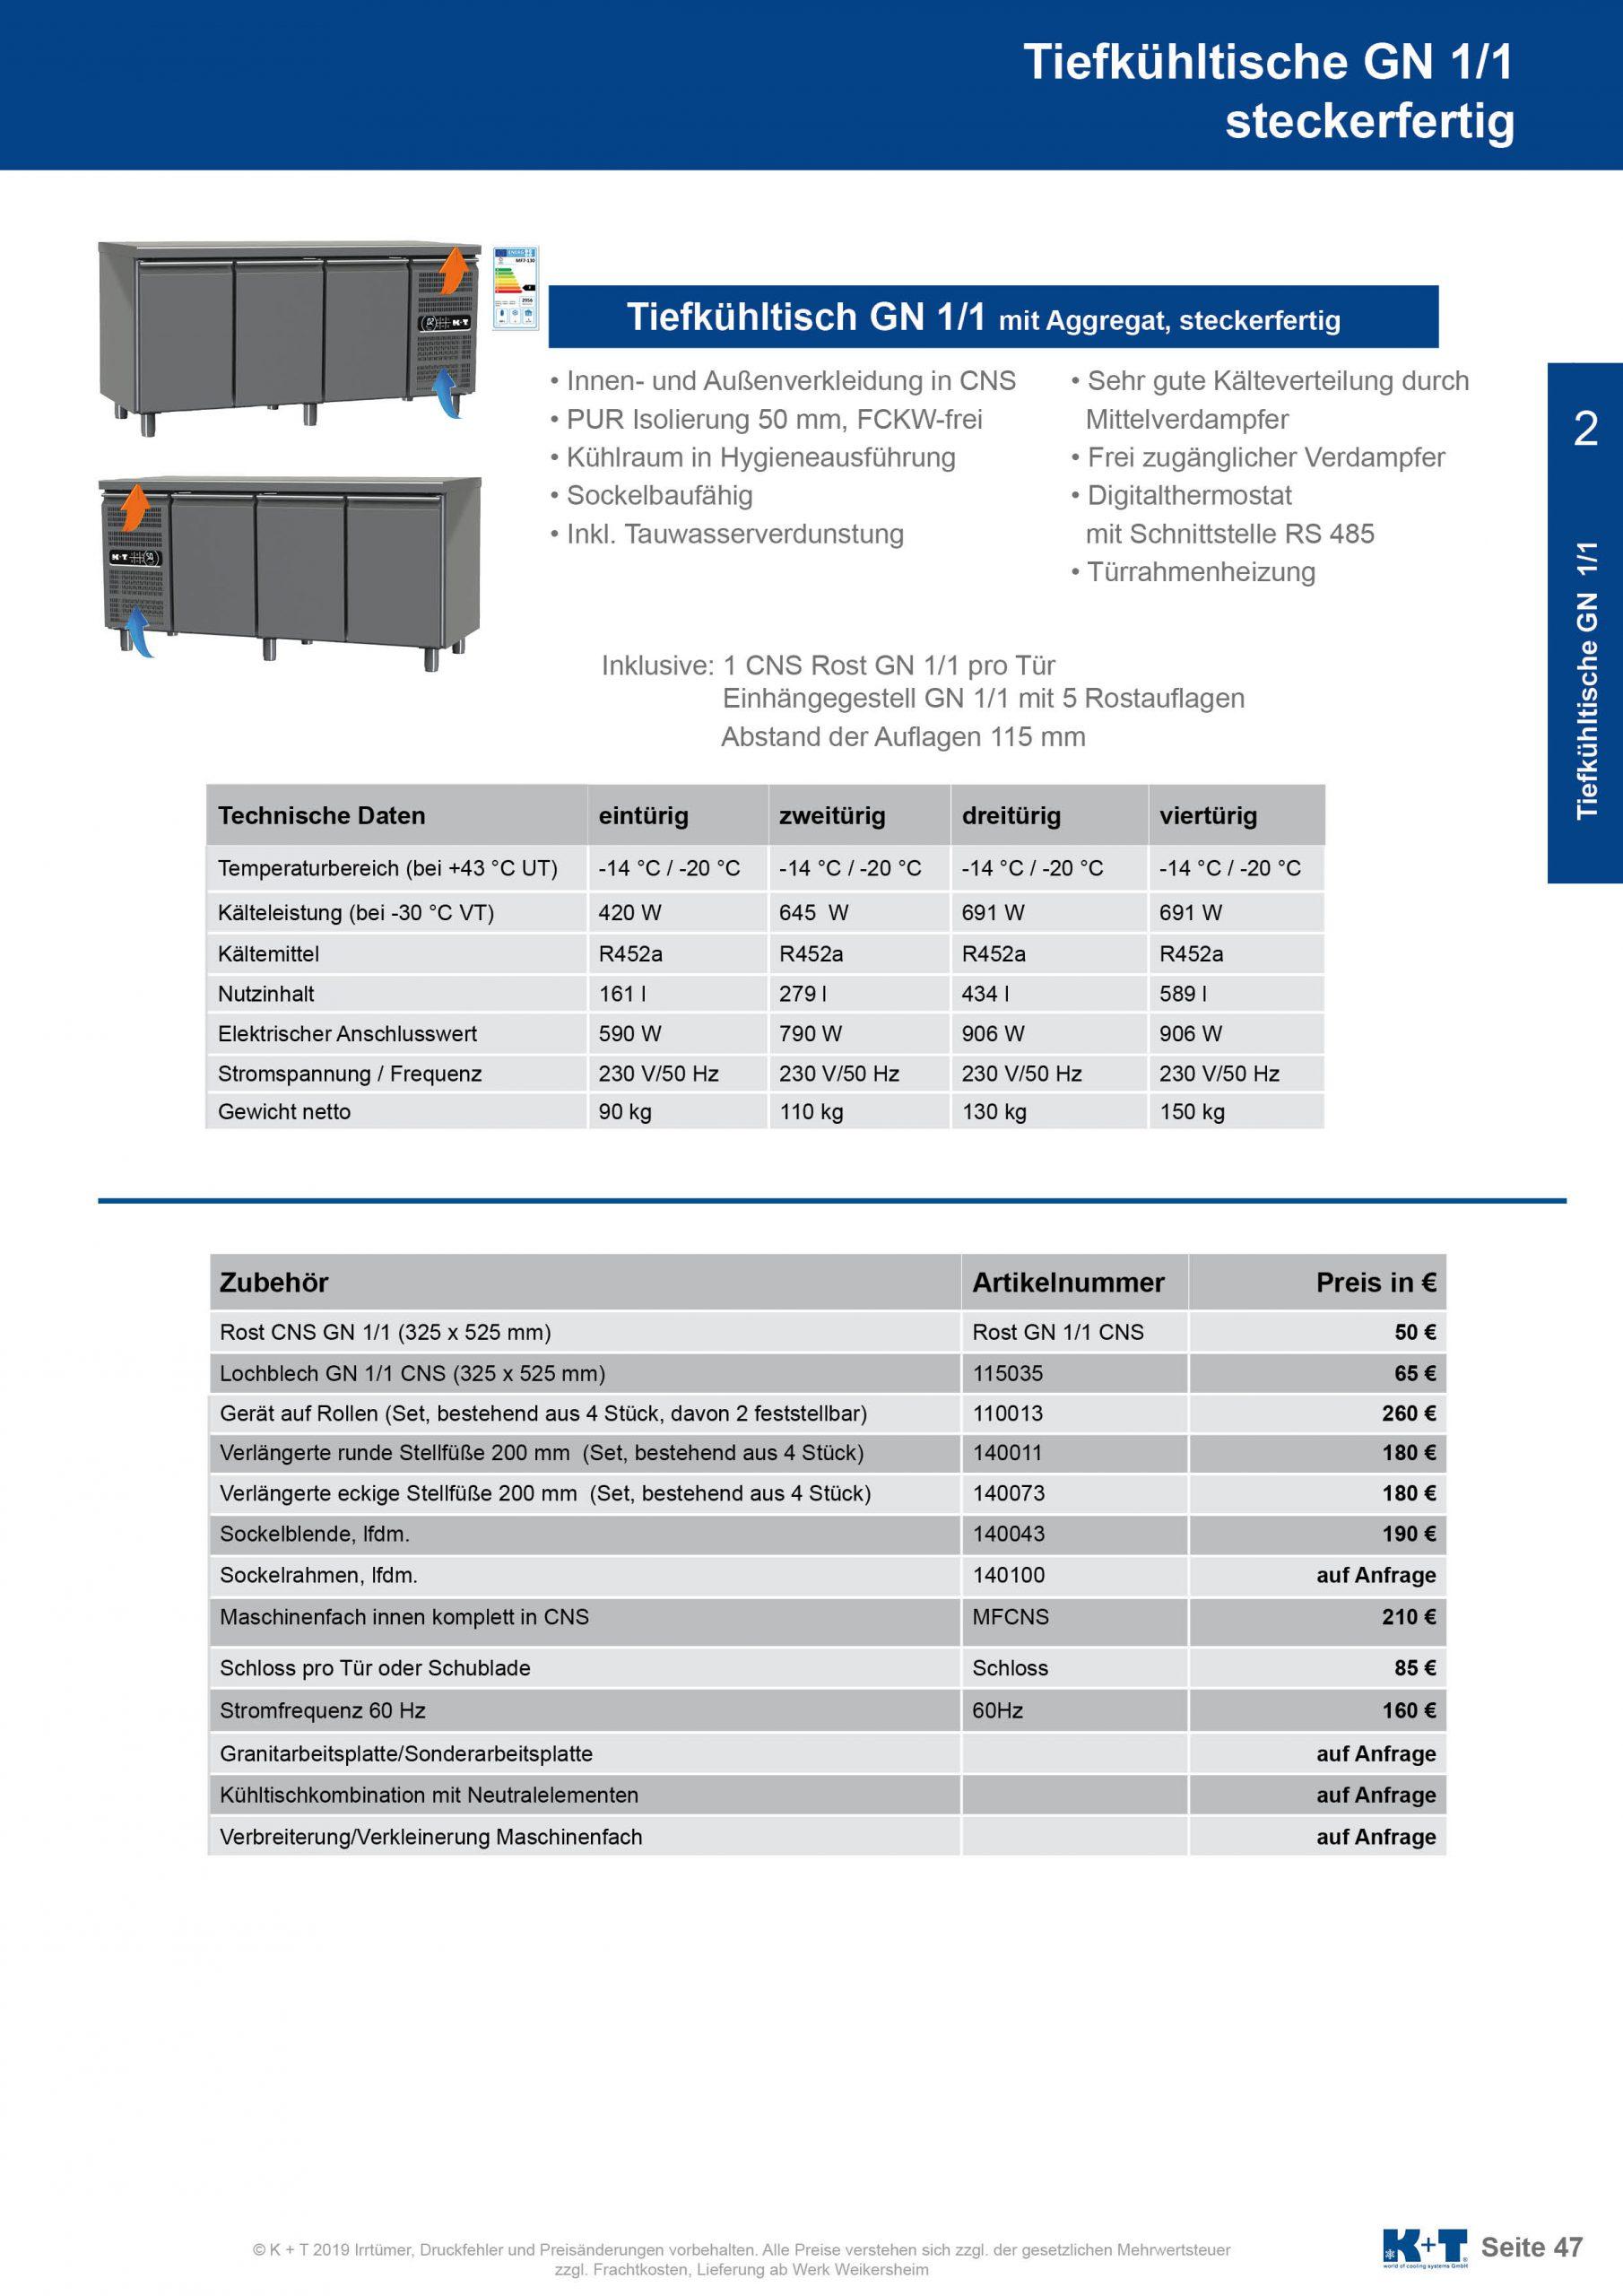 Tiefkühltisch GN 1_1 Korpus 700 steckerfertig 2